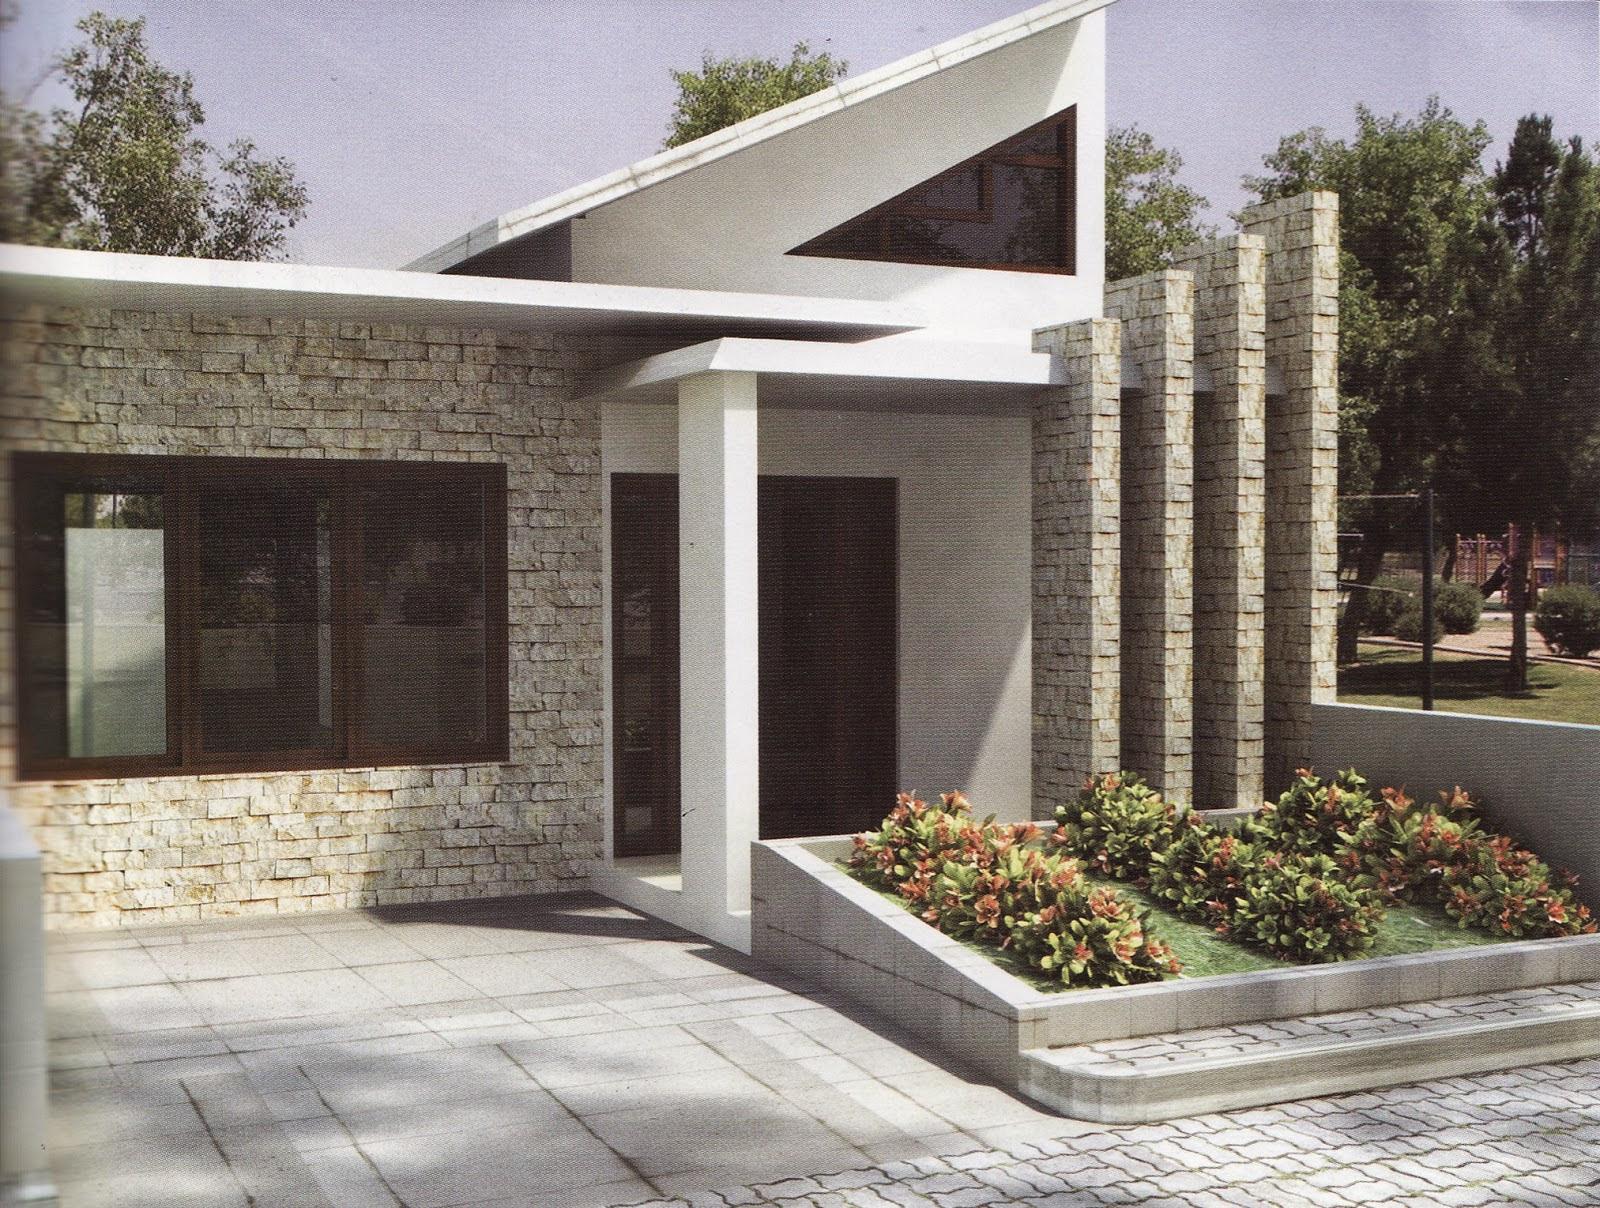 62 Desain Rumah Minimalis Modern Jepang